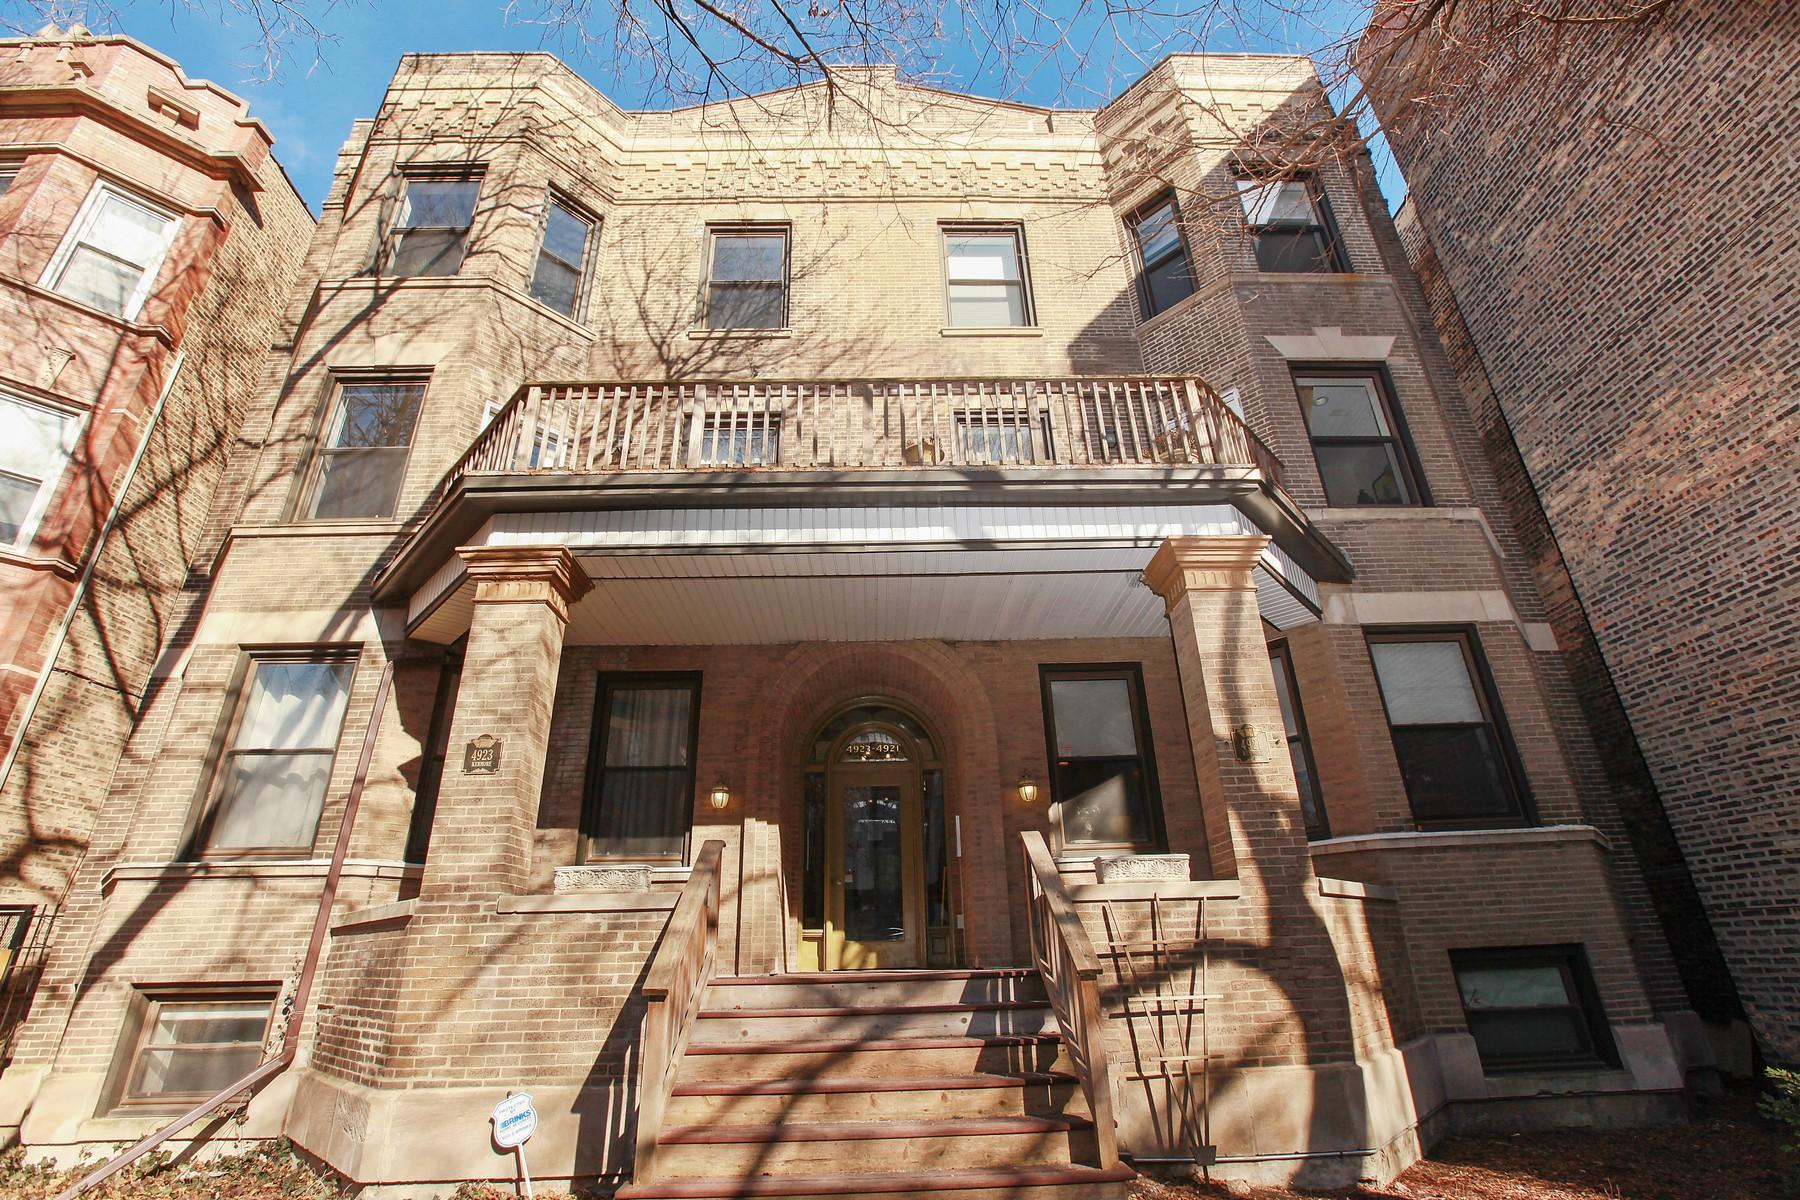 Condominium for Sale at Massive Top Floor Gut Rehab 4921 N Kenmore Avenue Unit 3 Uptown, Chicago, Illinois, 60640 United States